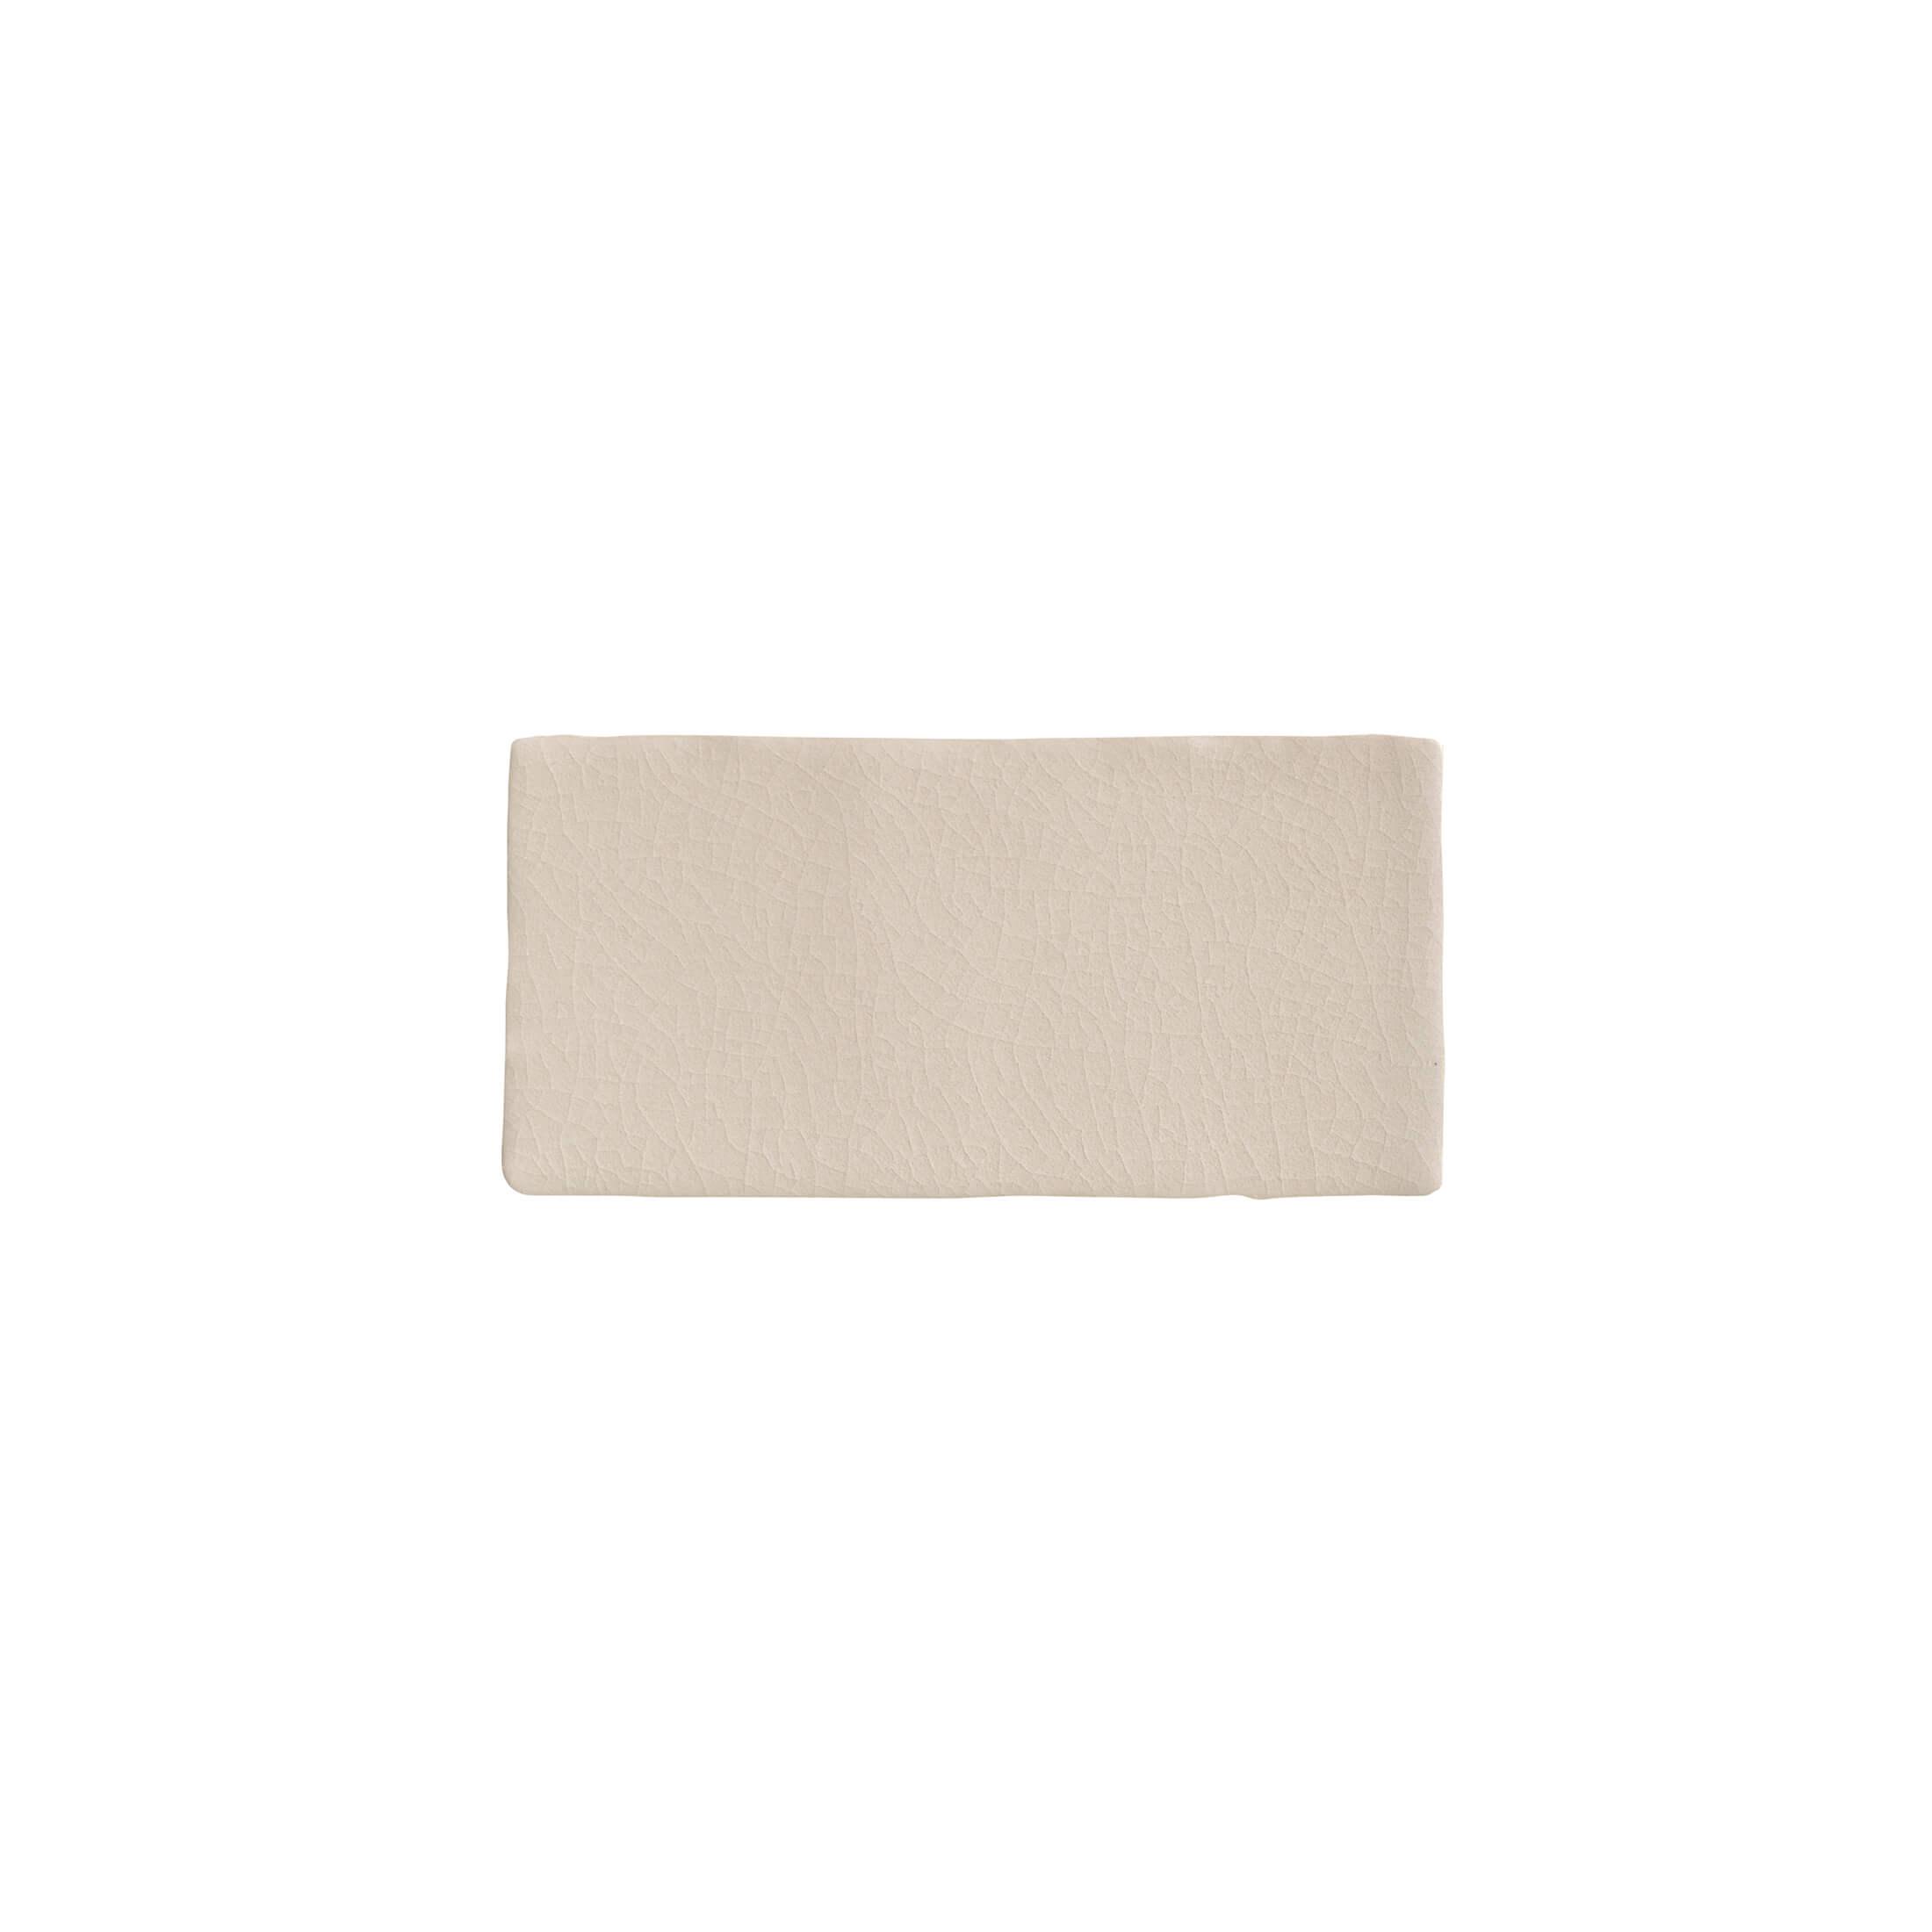 ADEH1007 - LISO  - 7.5 cm X 15 cm